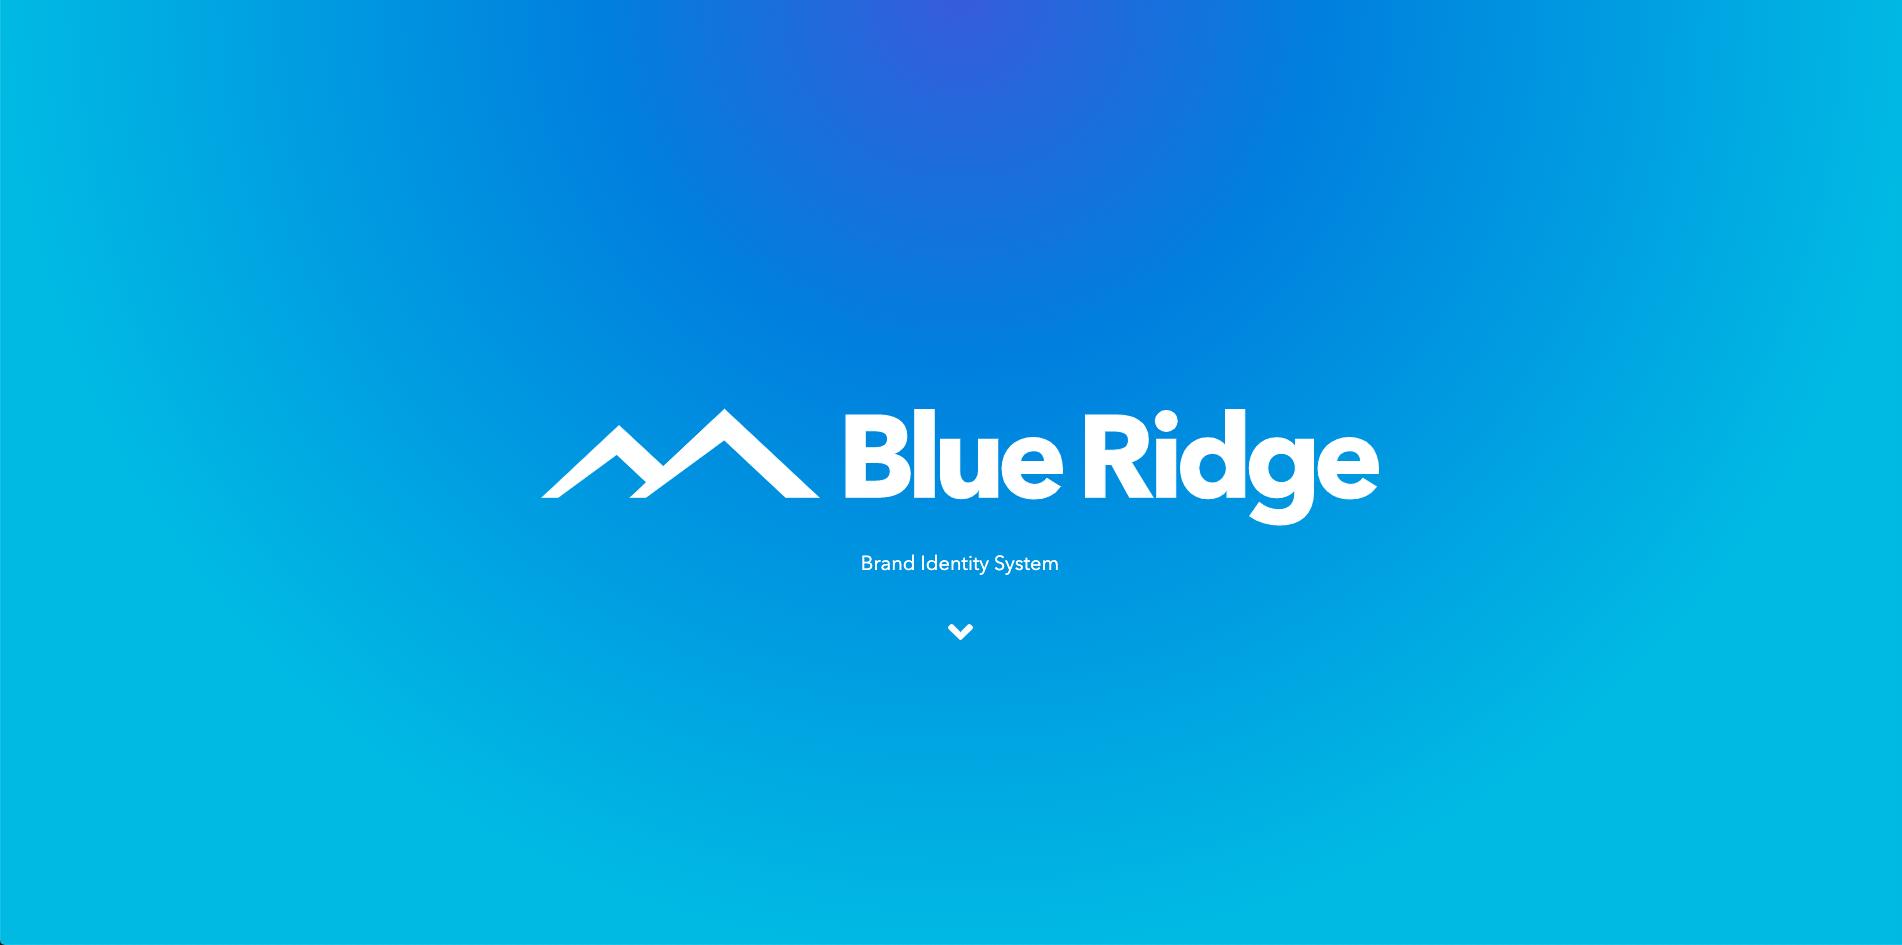 Blue Ridge Branding Guidelines